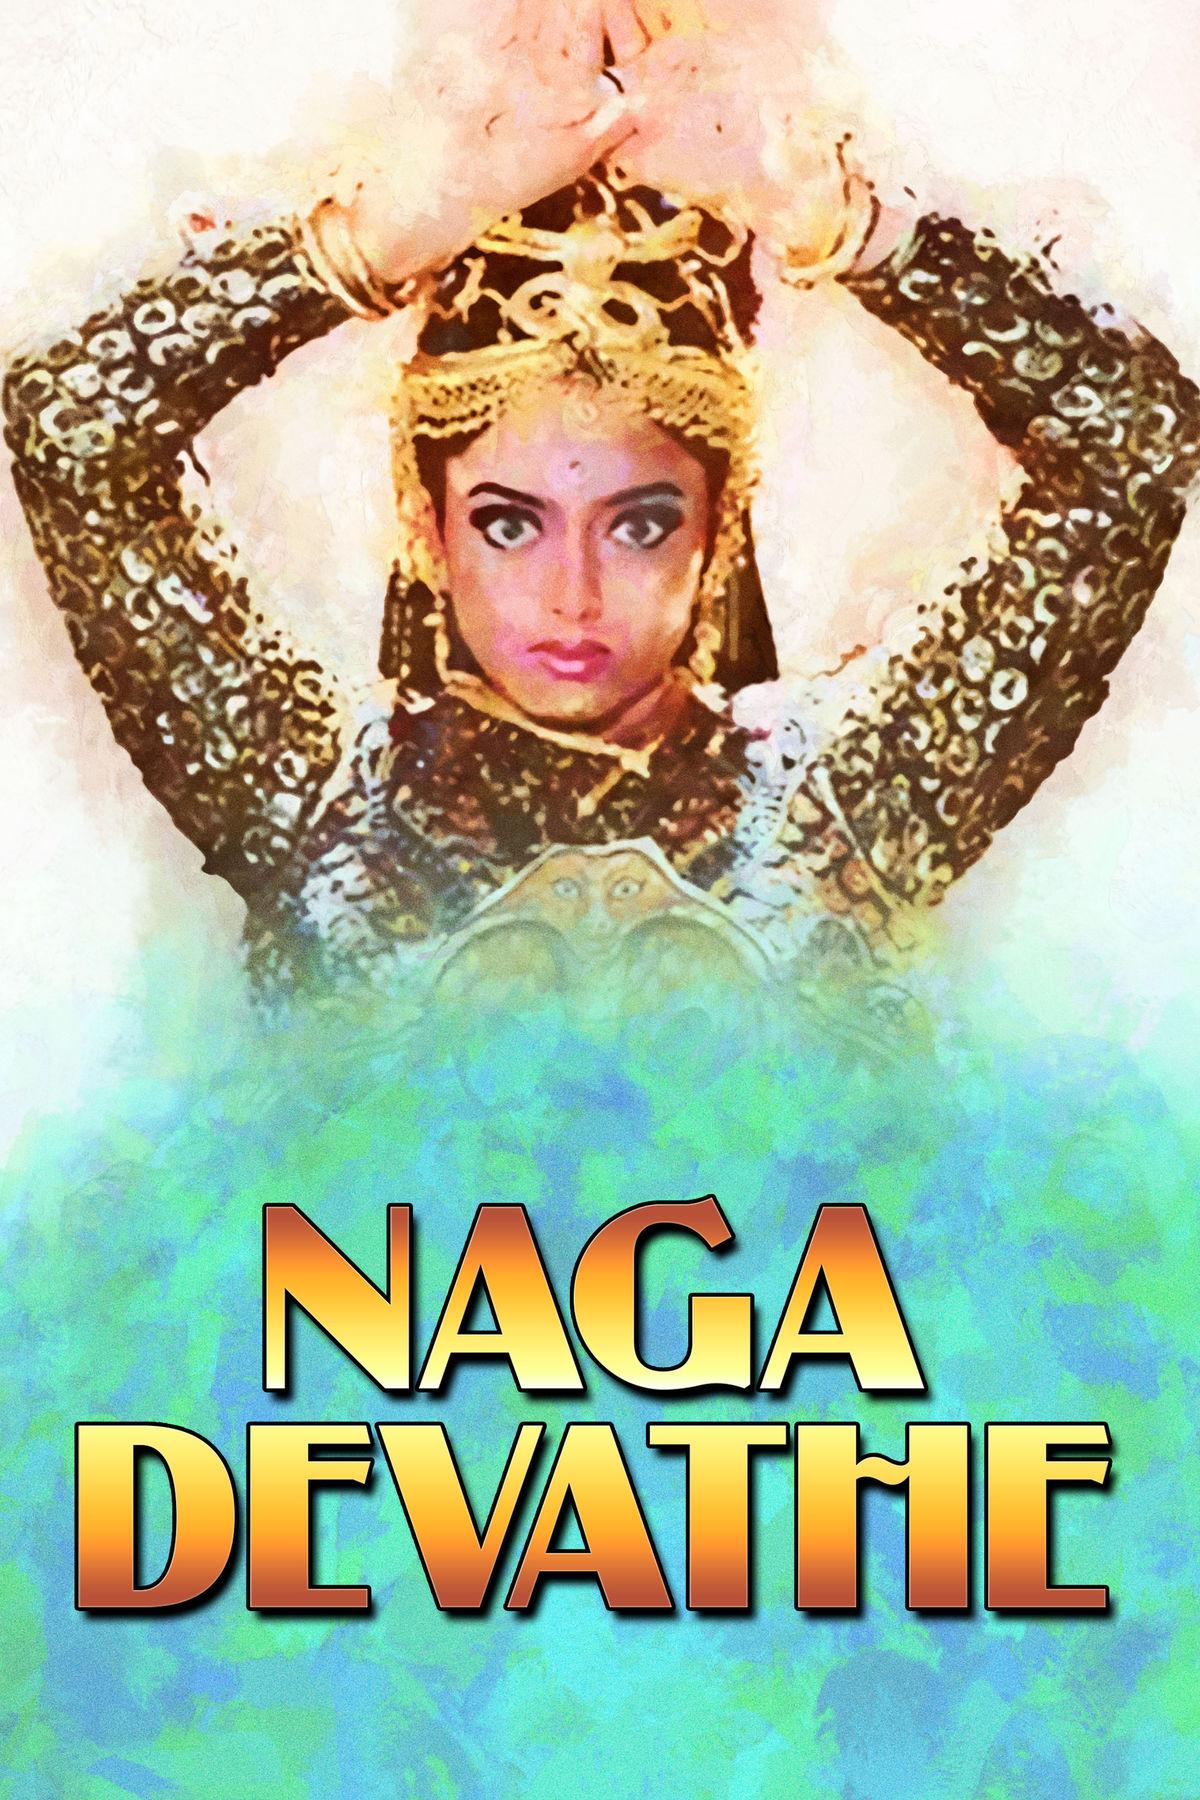 Shivakumar Best Movies, TV Shows and Web Series List